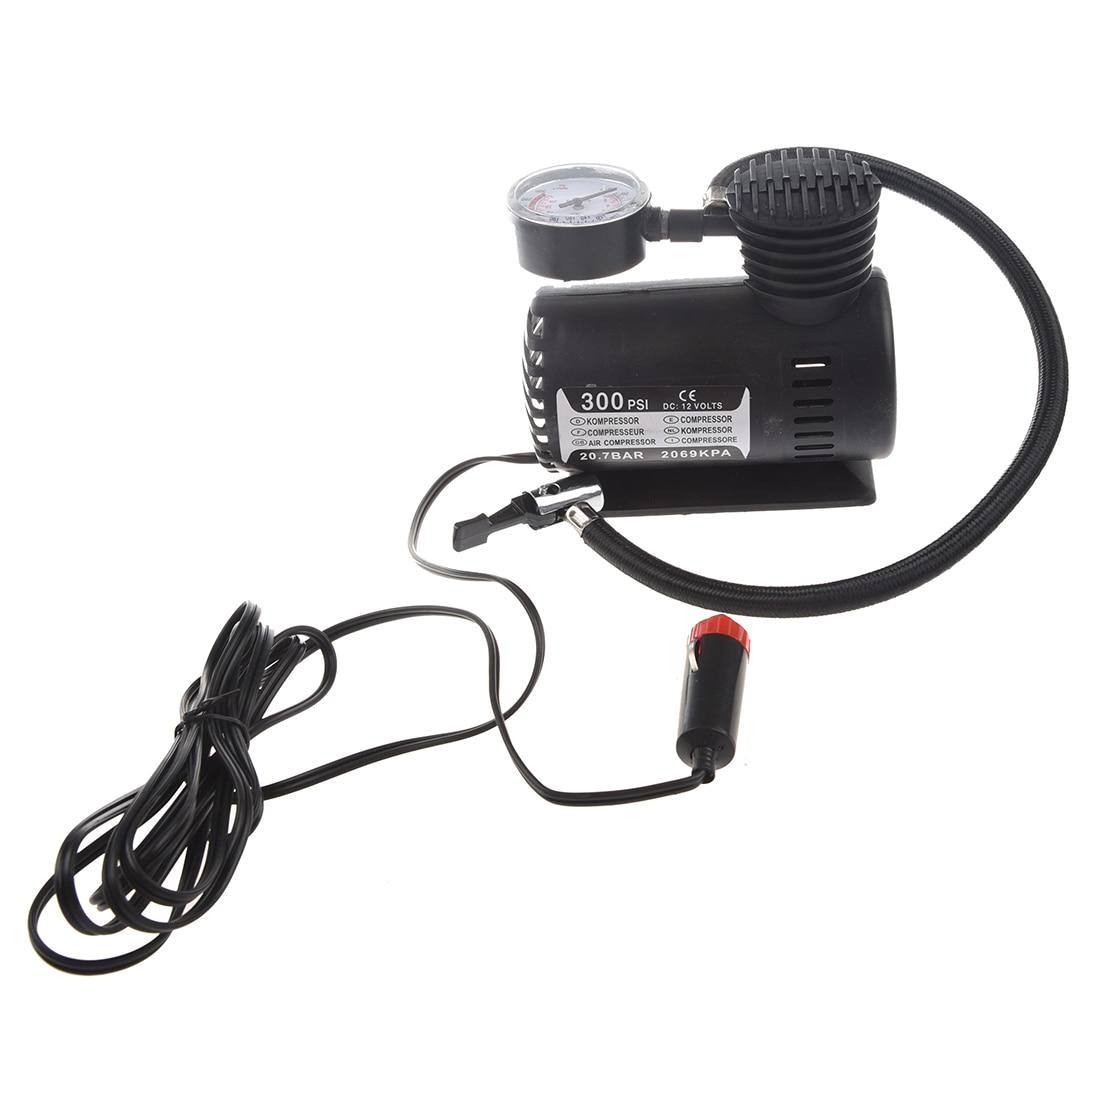 TOYL 12V Car TOYL Electric Pump Air Compressor Portable Tire Inflator 300PSI K590